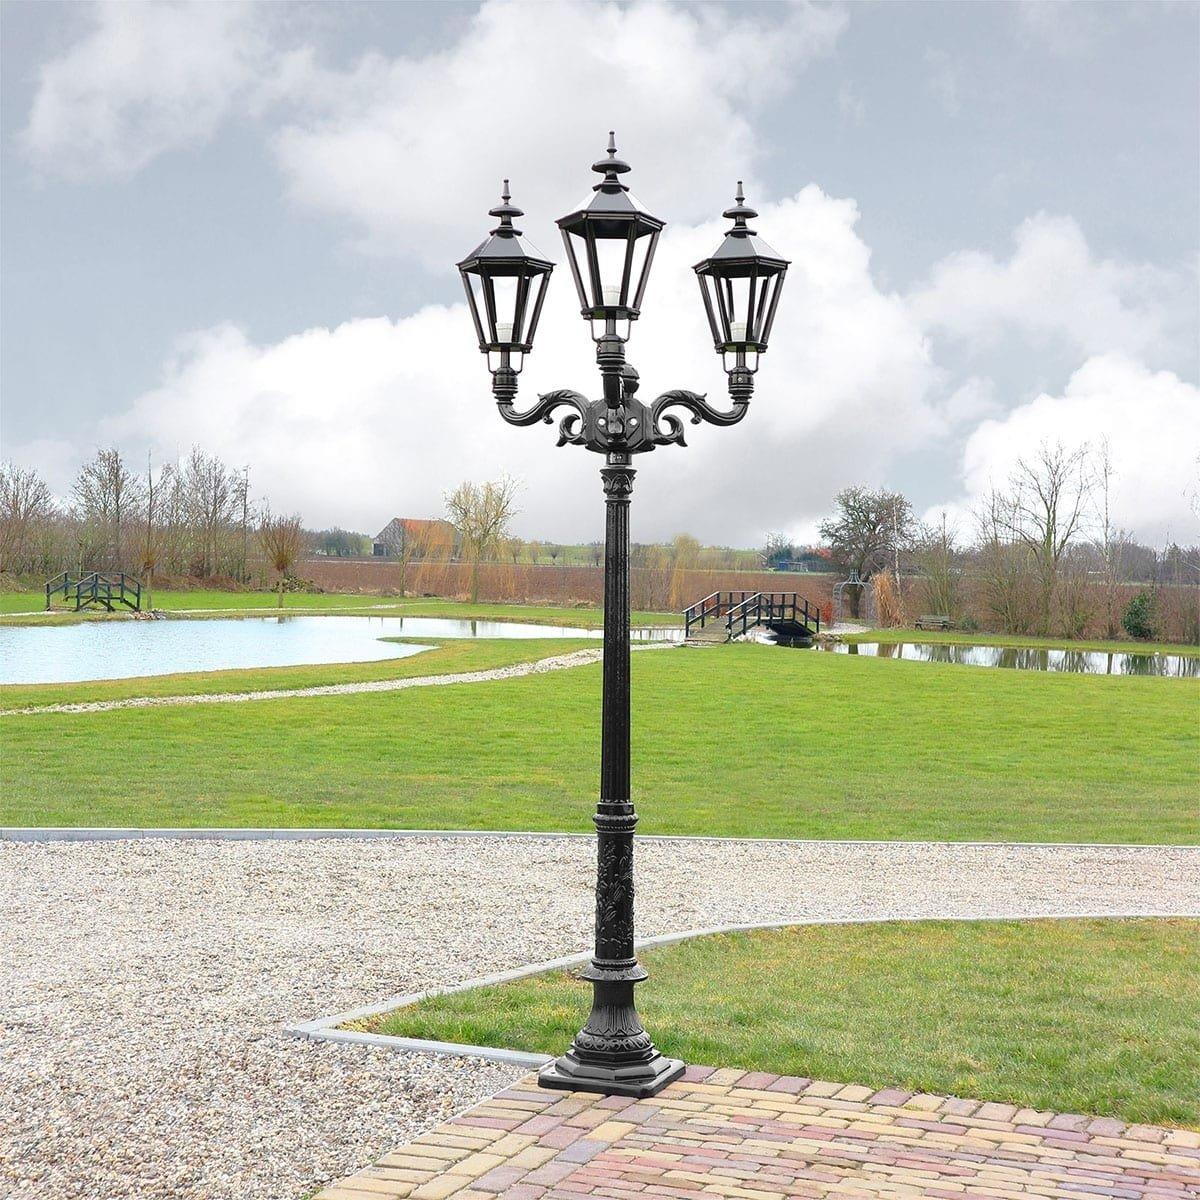 Outdoor Lighting Classic Rural Lantern Pole the 30's Exloo 3-light - 253 cm